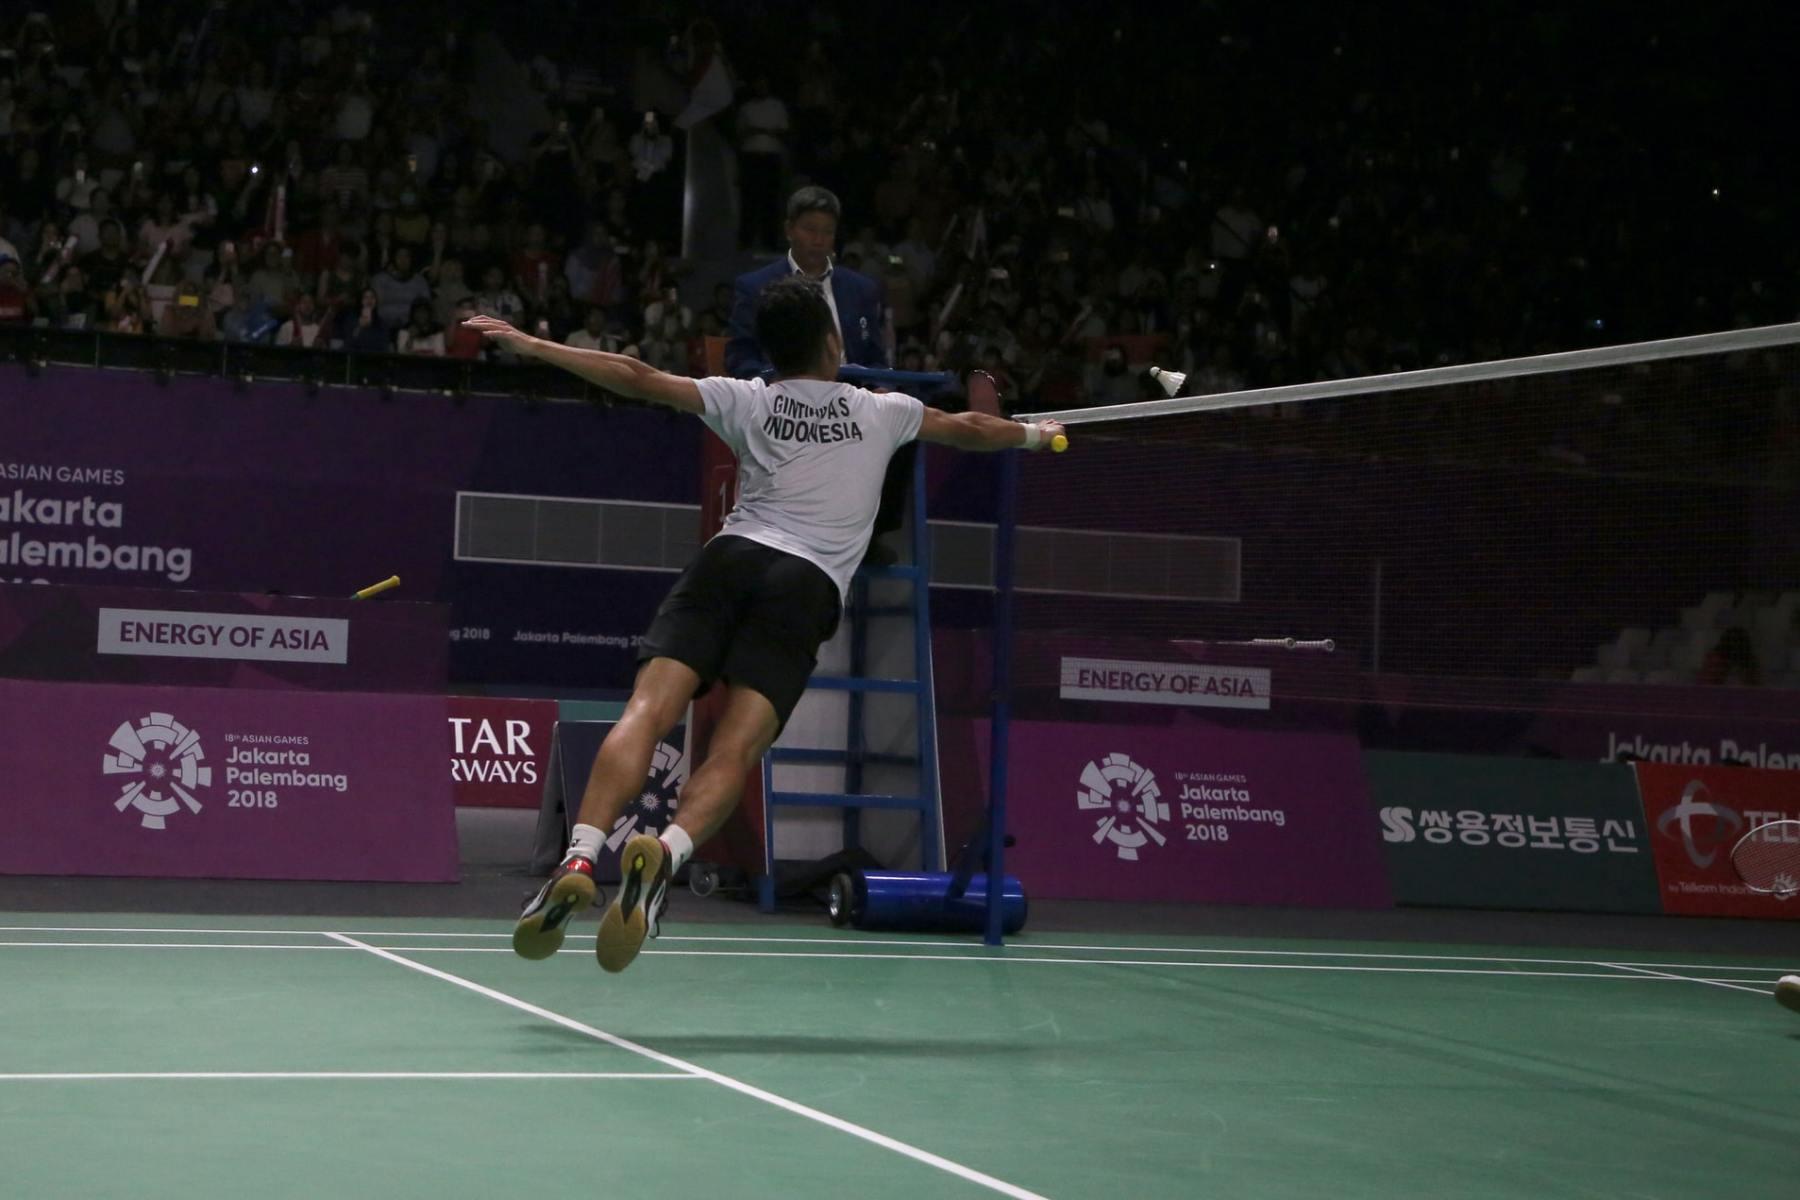 ginting-badminton-athlete